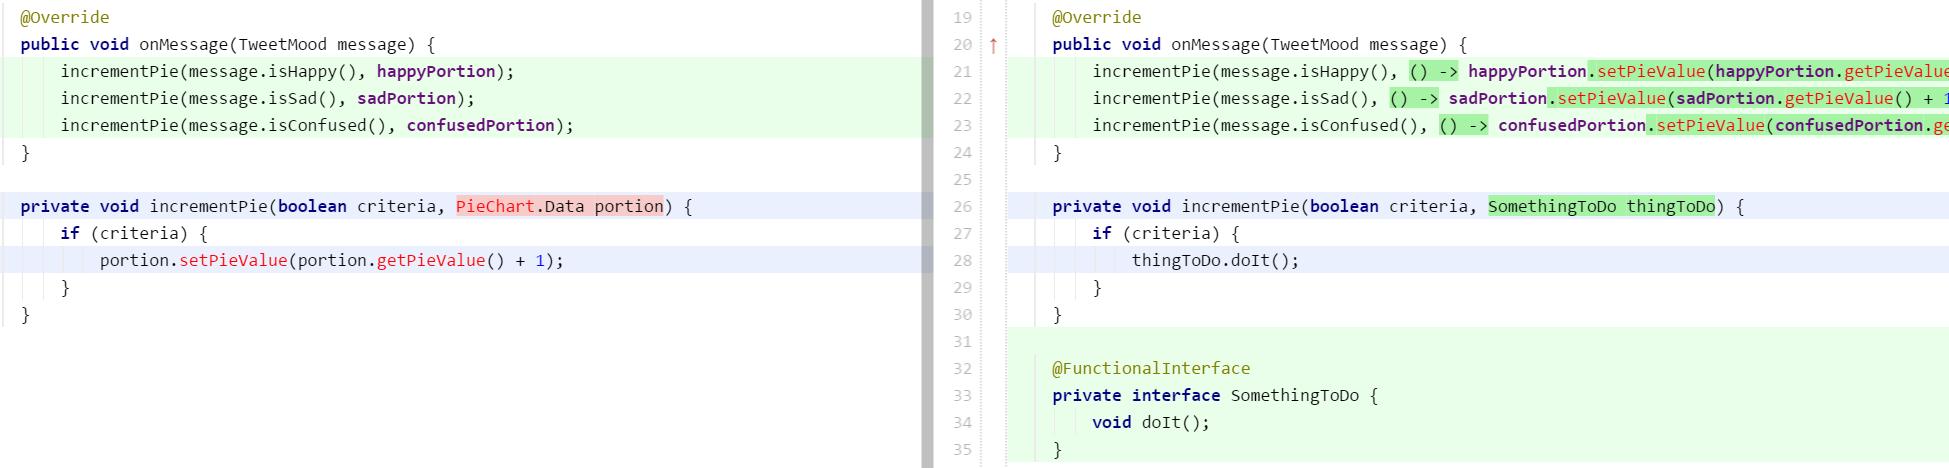 Lambda parameter unnecessary